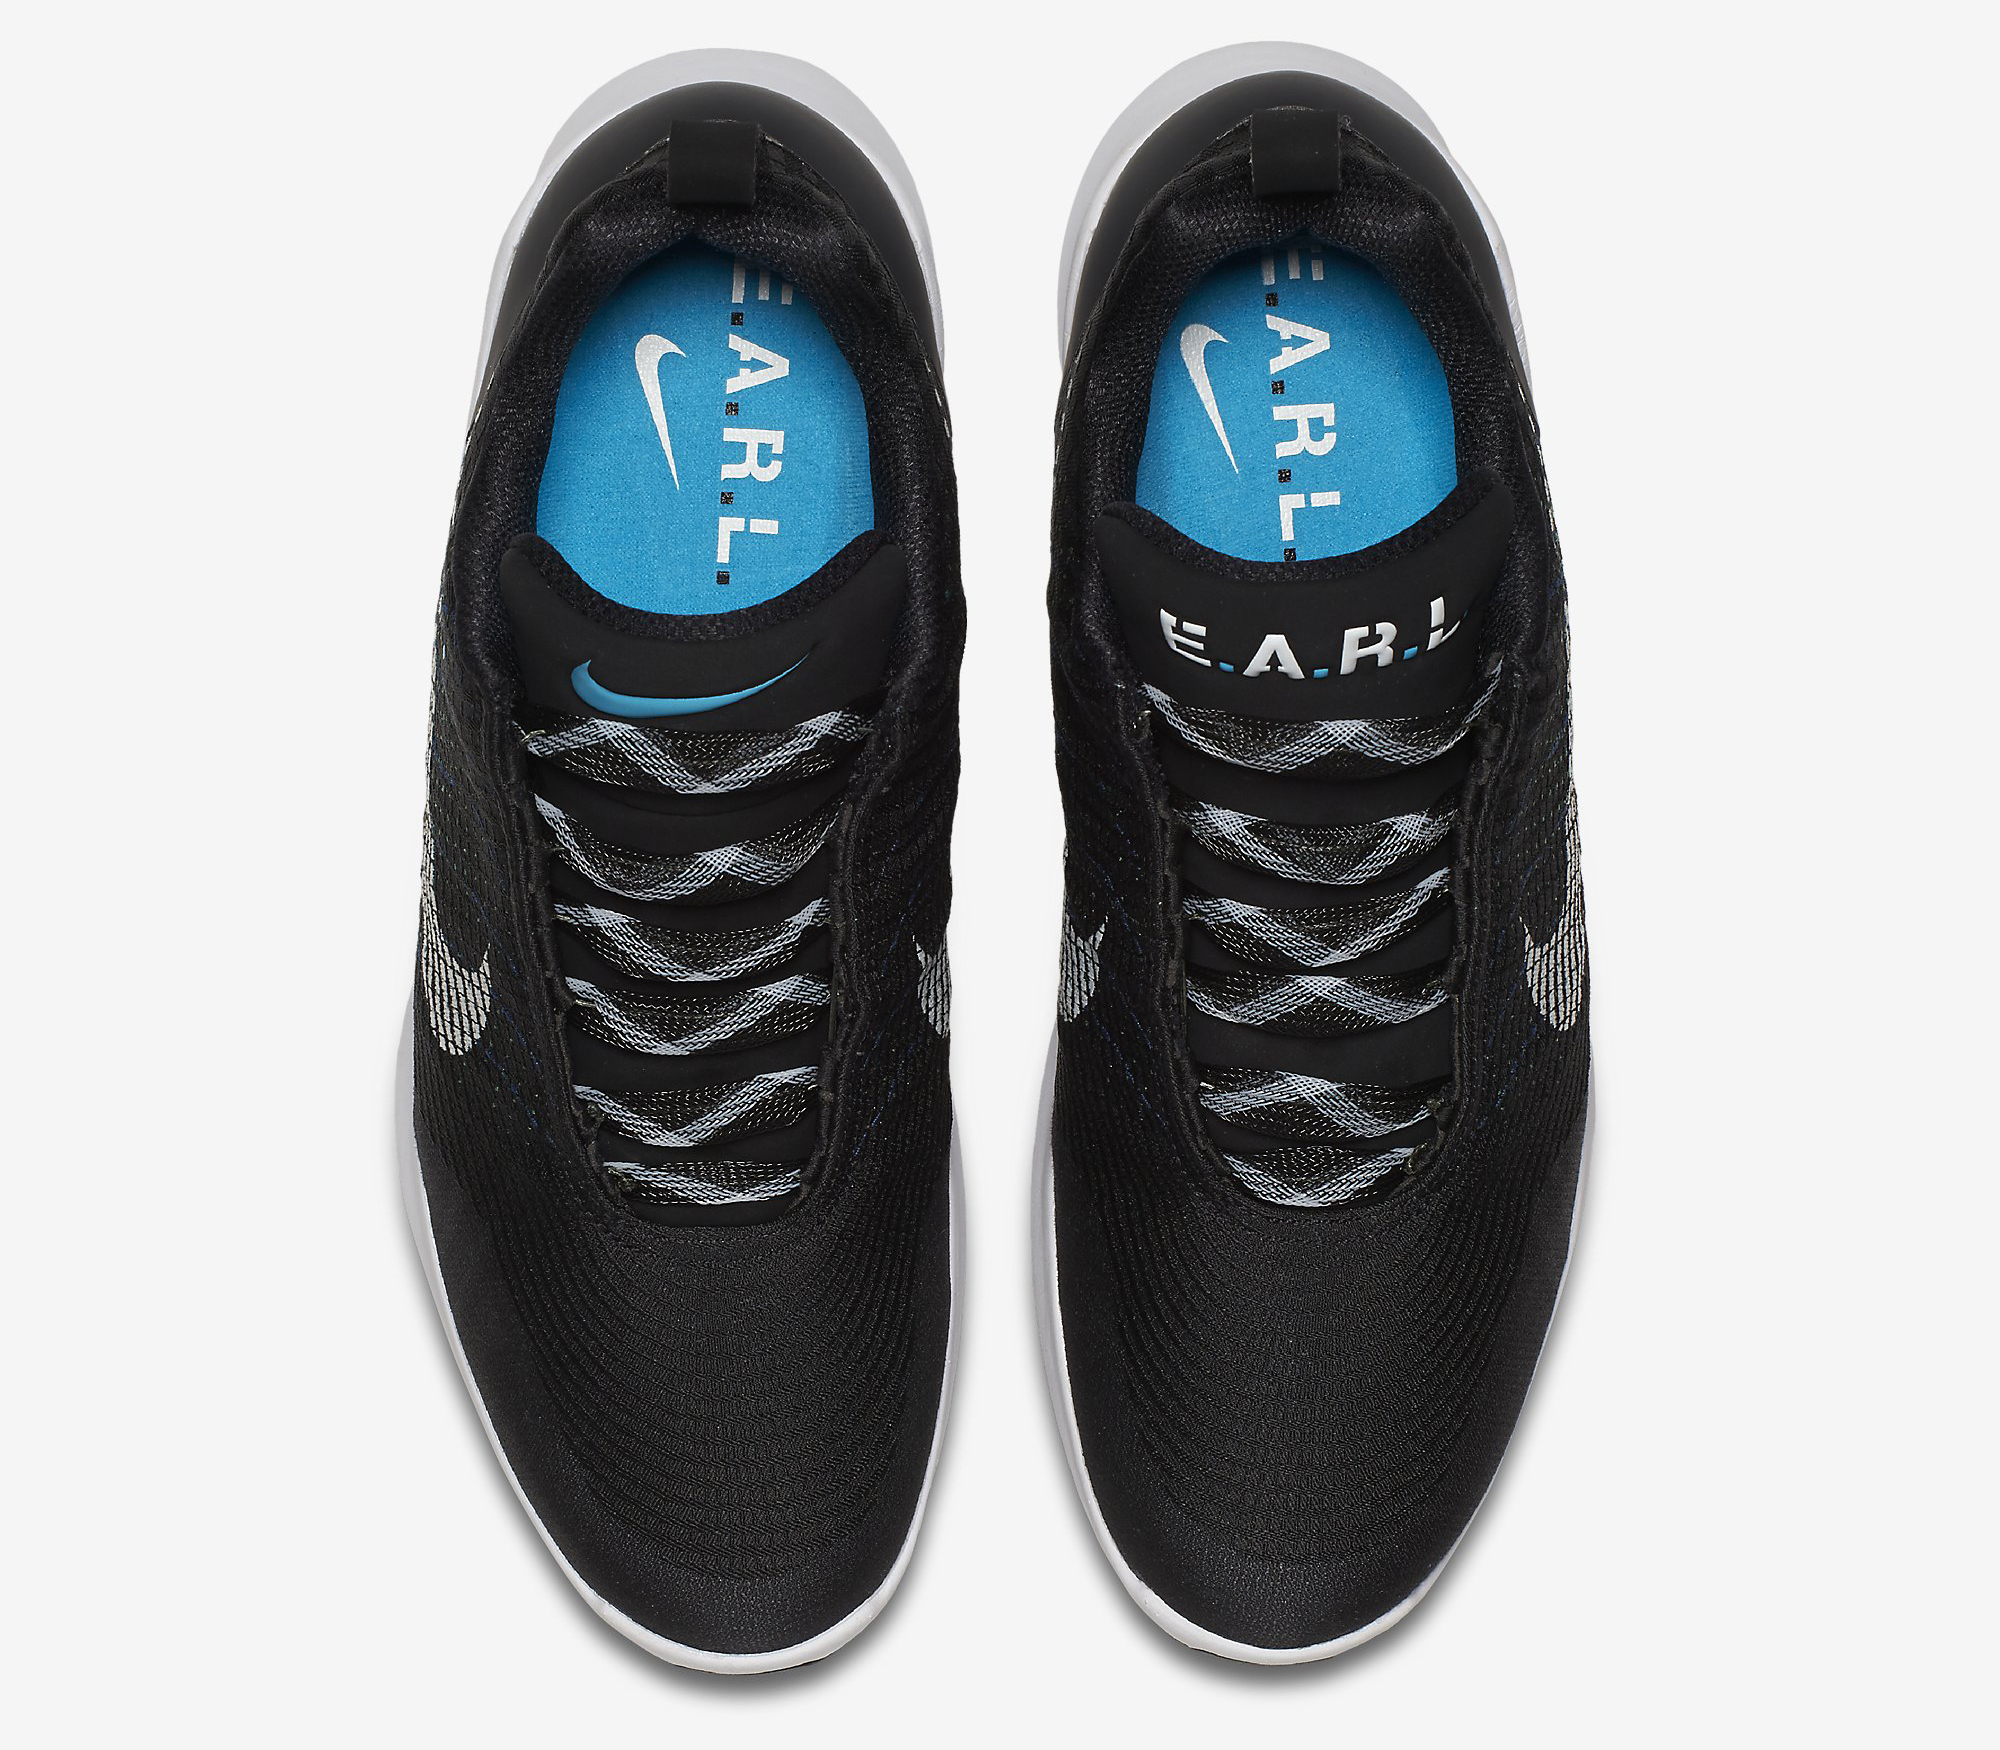 Nike Hyperadapt 843871-001 Top